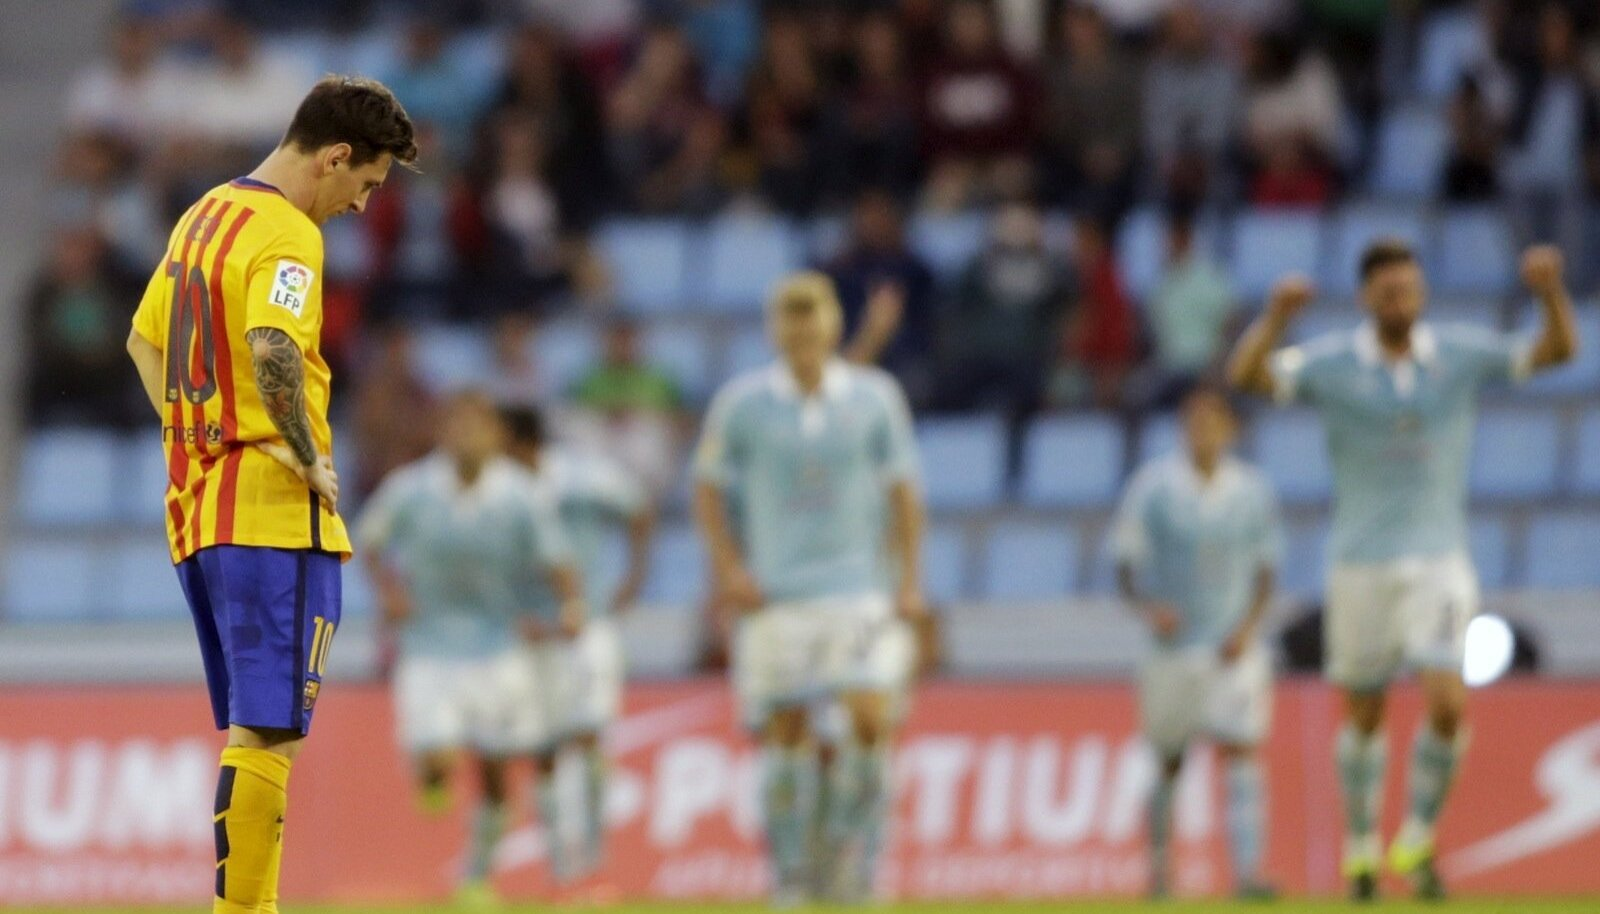 Barcelona's Messi reacts after a goal of Celta Vigo during their Spanish first division soccer match at Balaidos stadium in Vigo